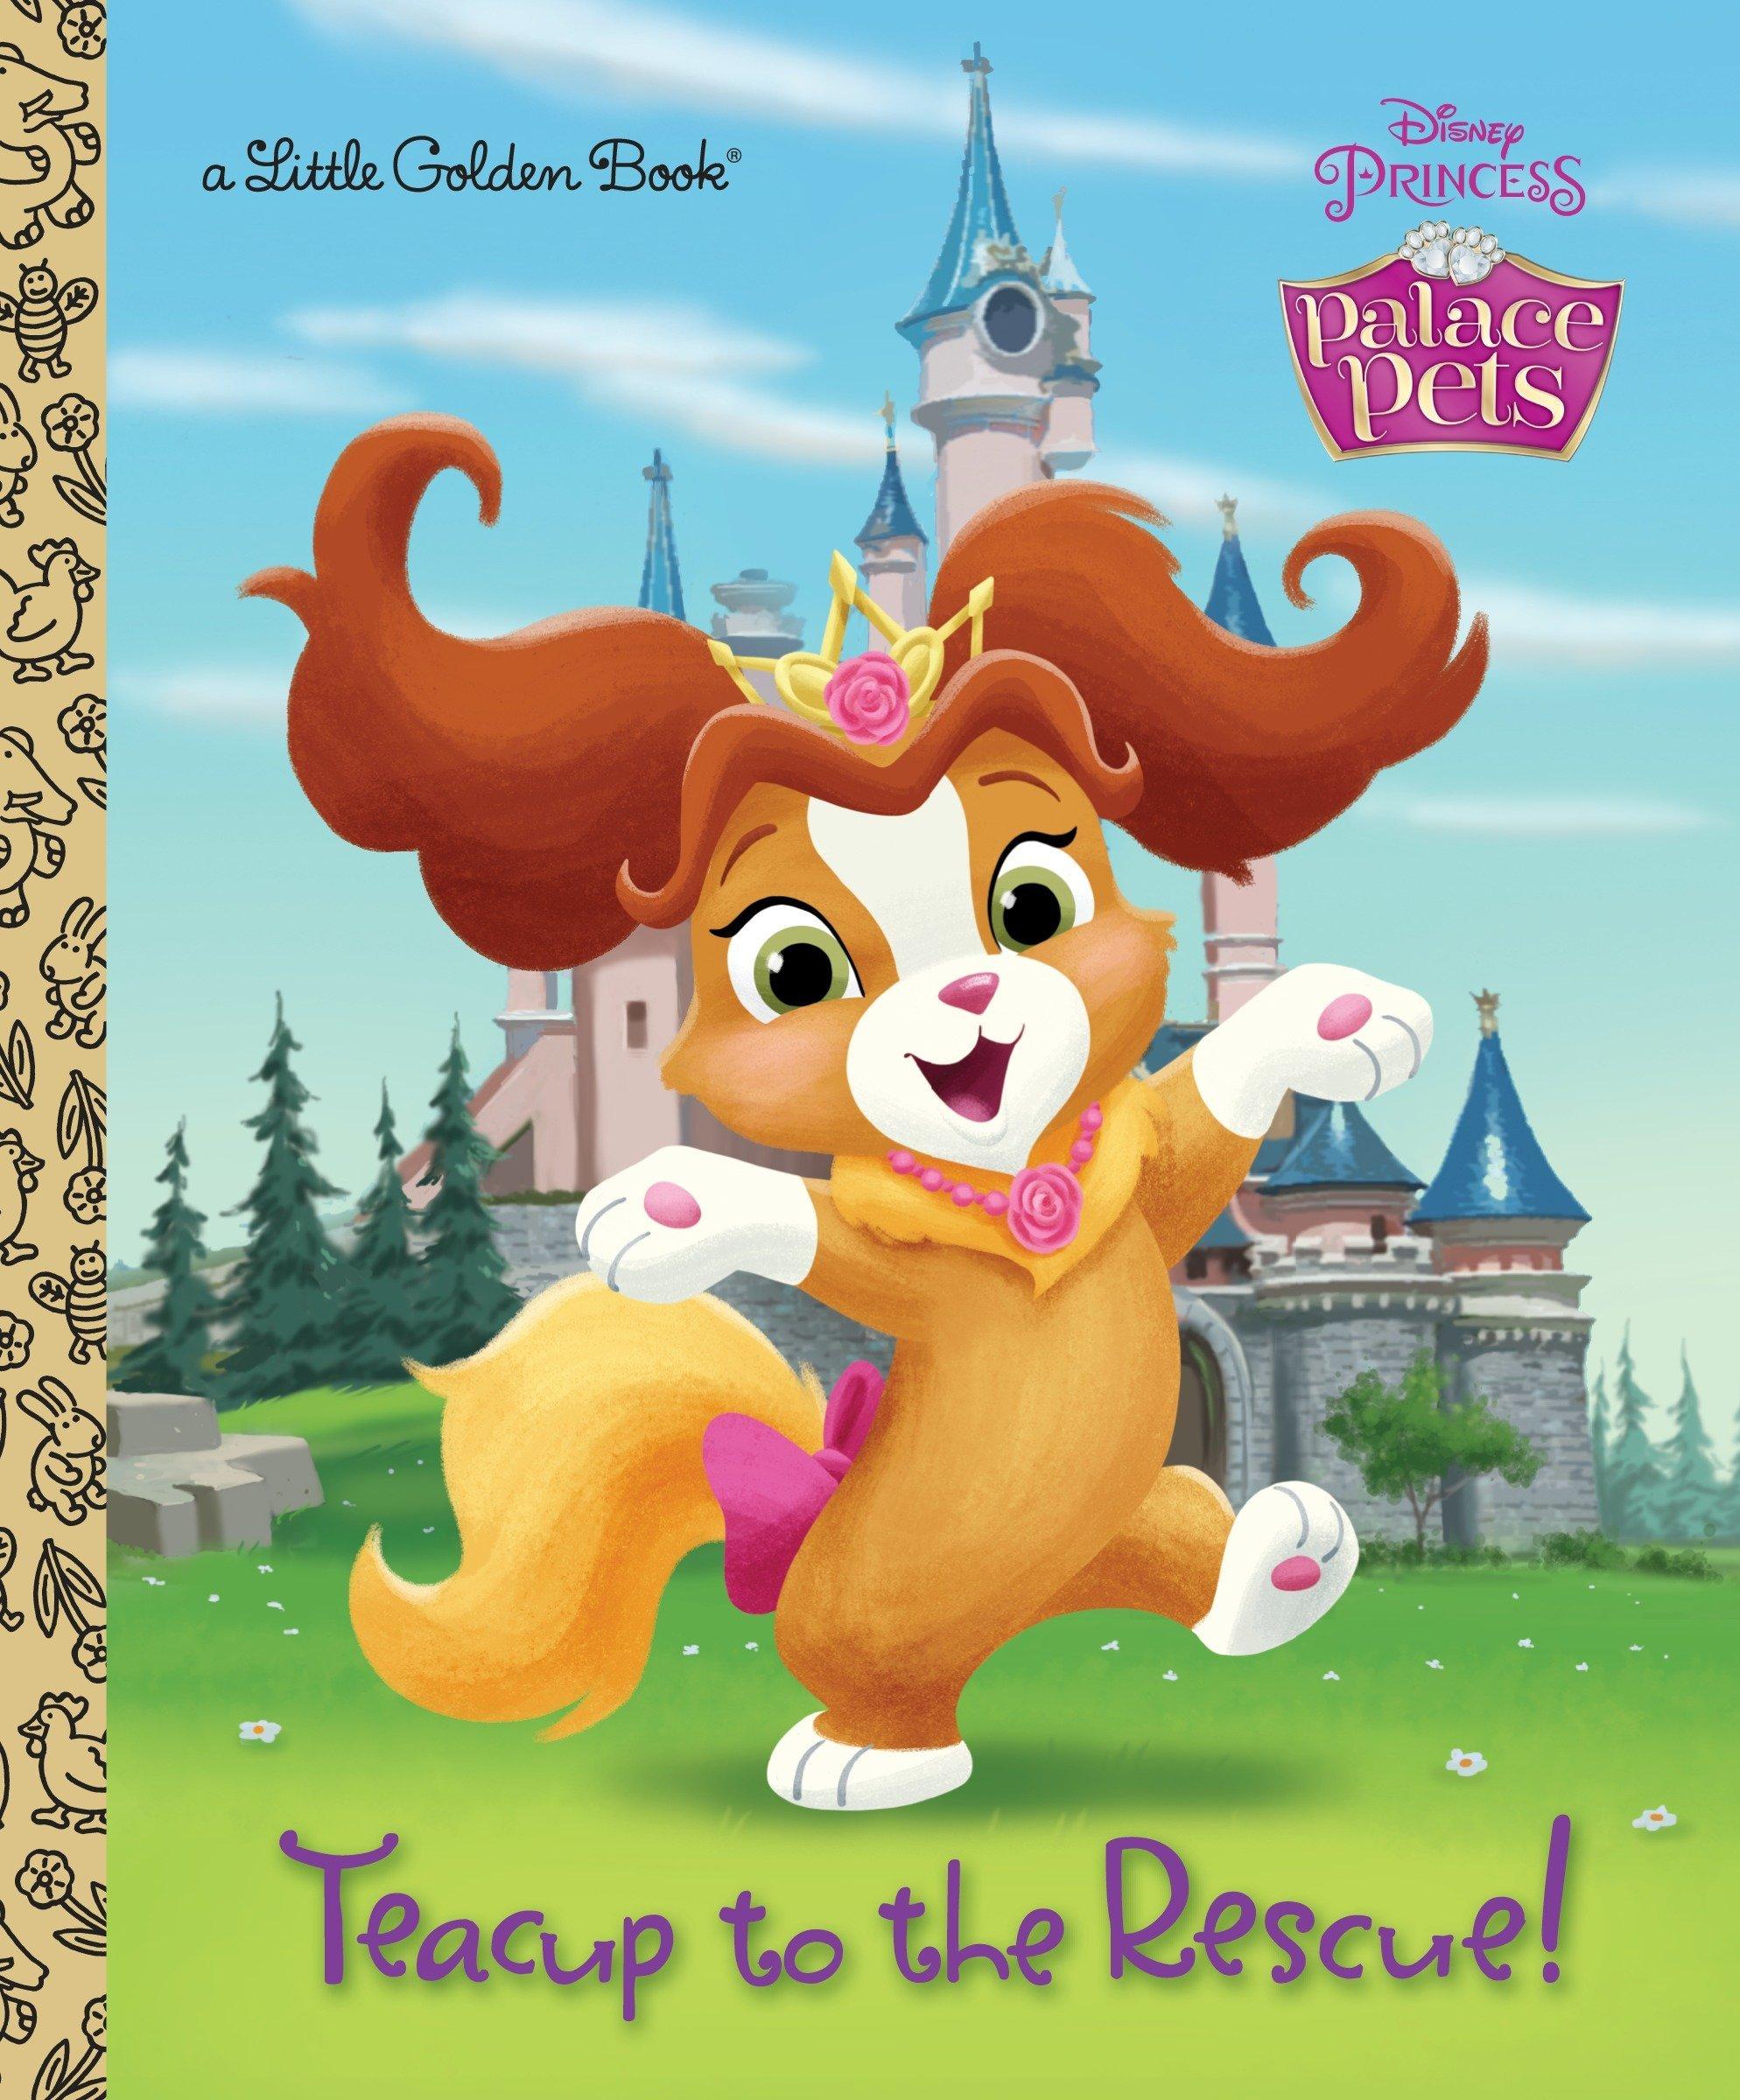 Teacup to the Rescue! (Disney Princess: Palace Pets) (Little